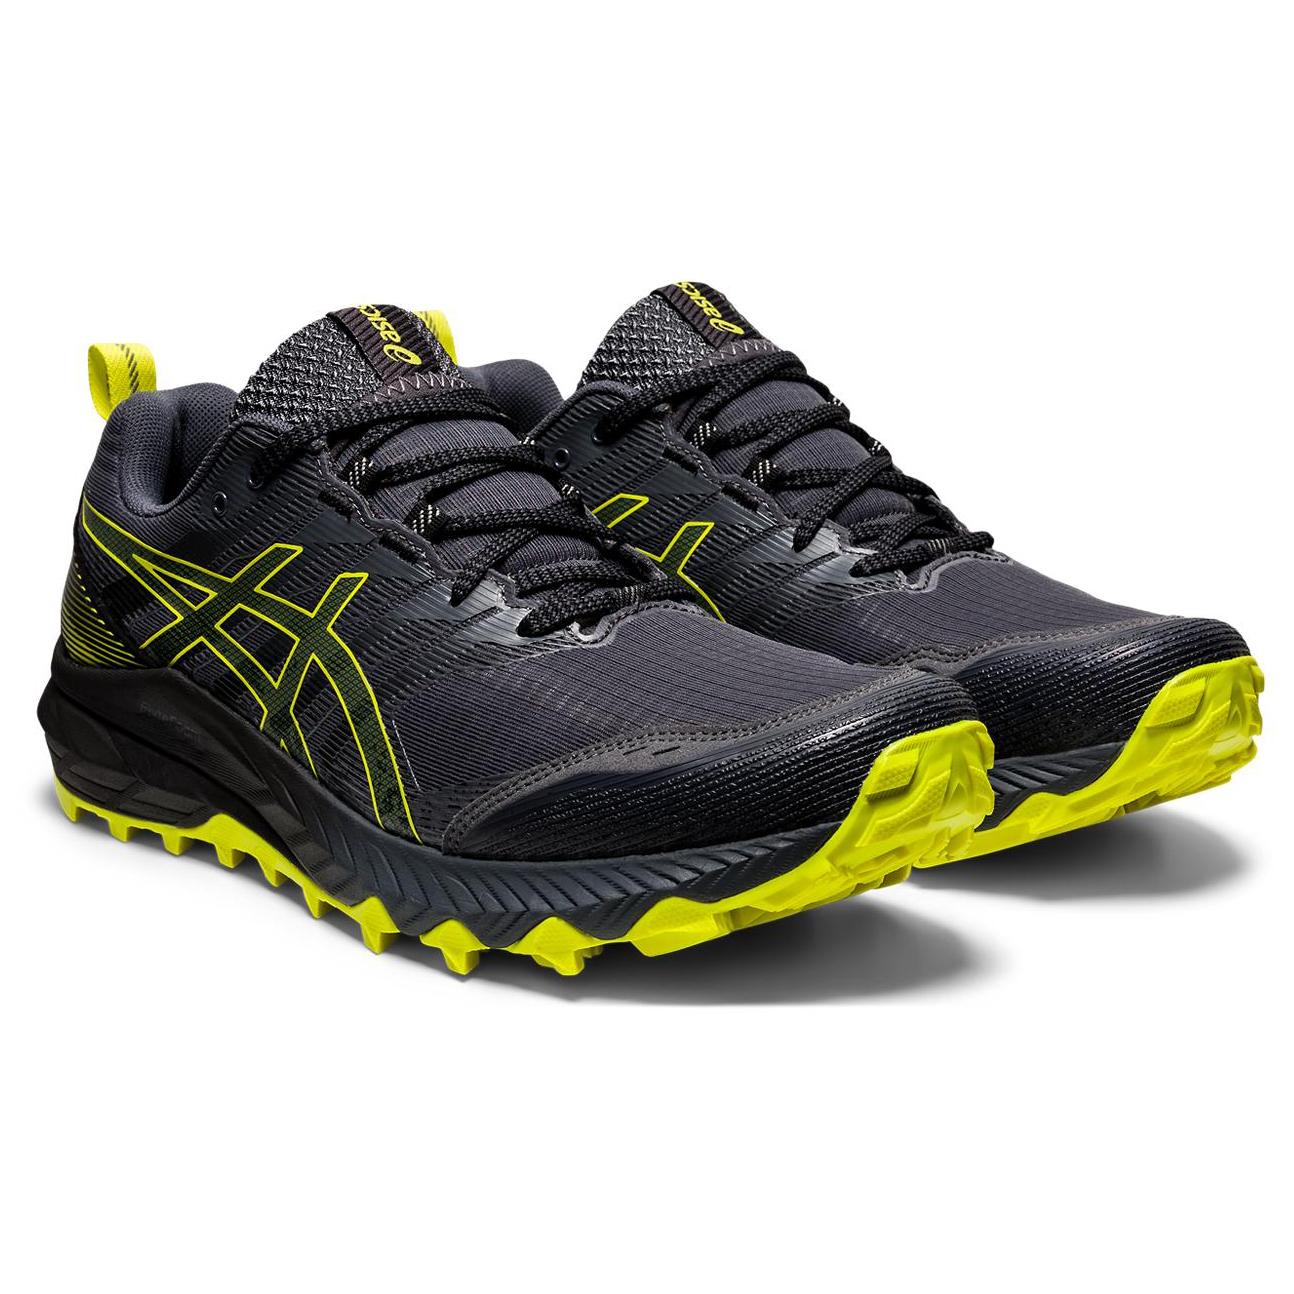 Asics - Gel-Trabuco 9 - Trail running shoes - Carrier Grey / Sour Yuzu | 8 (US)